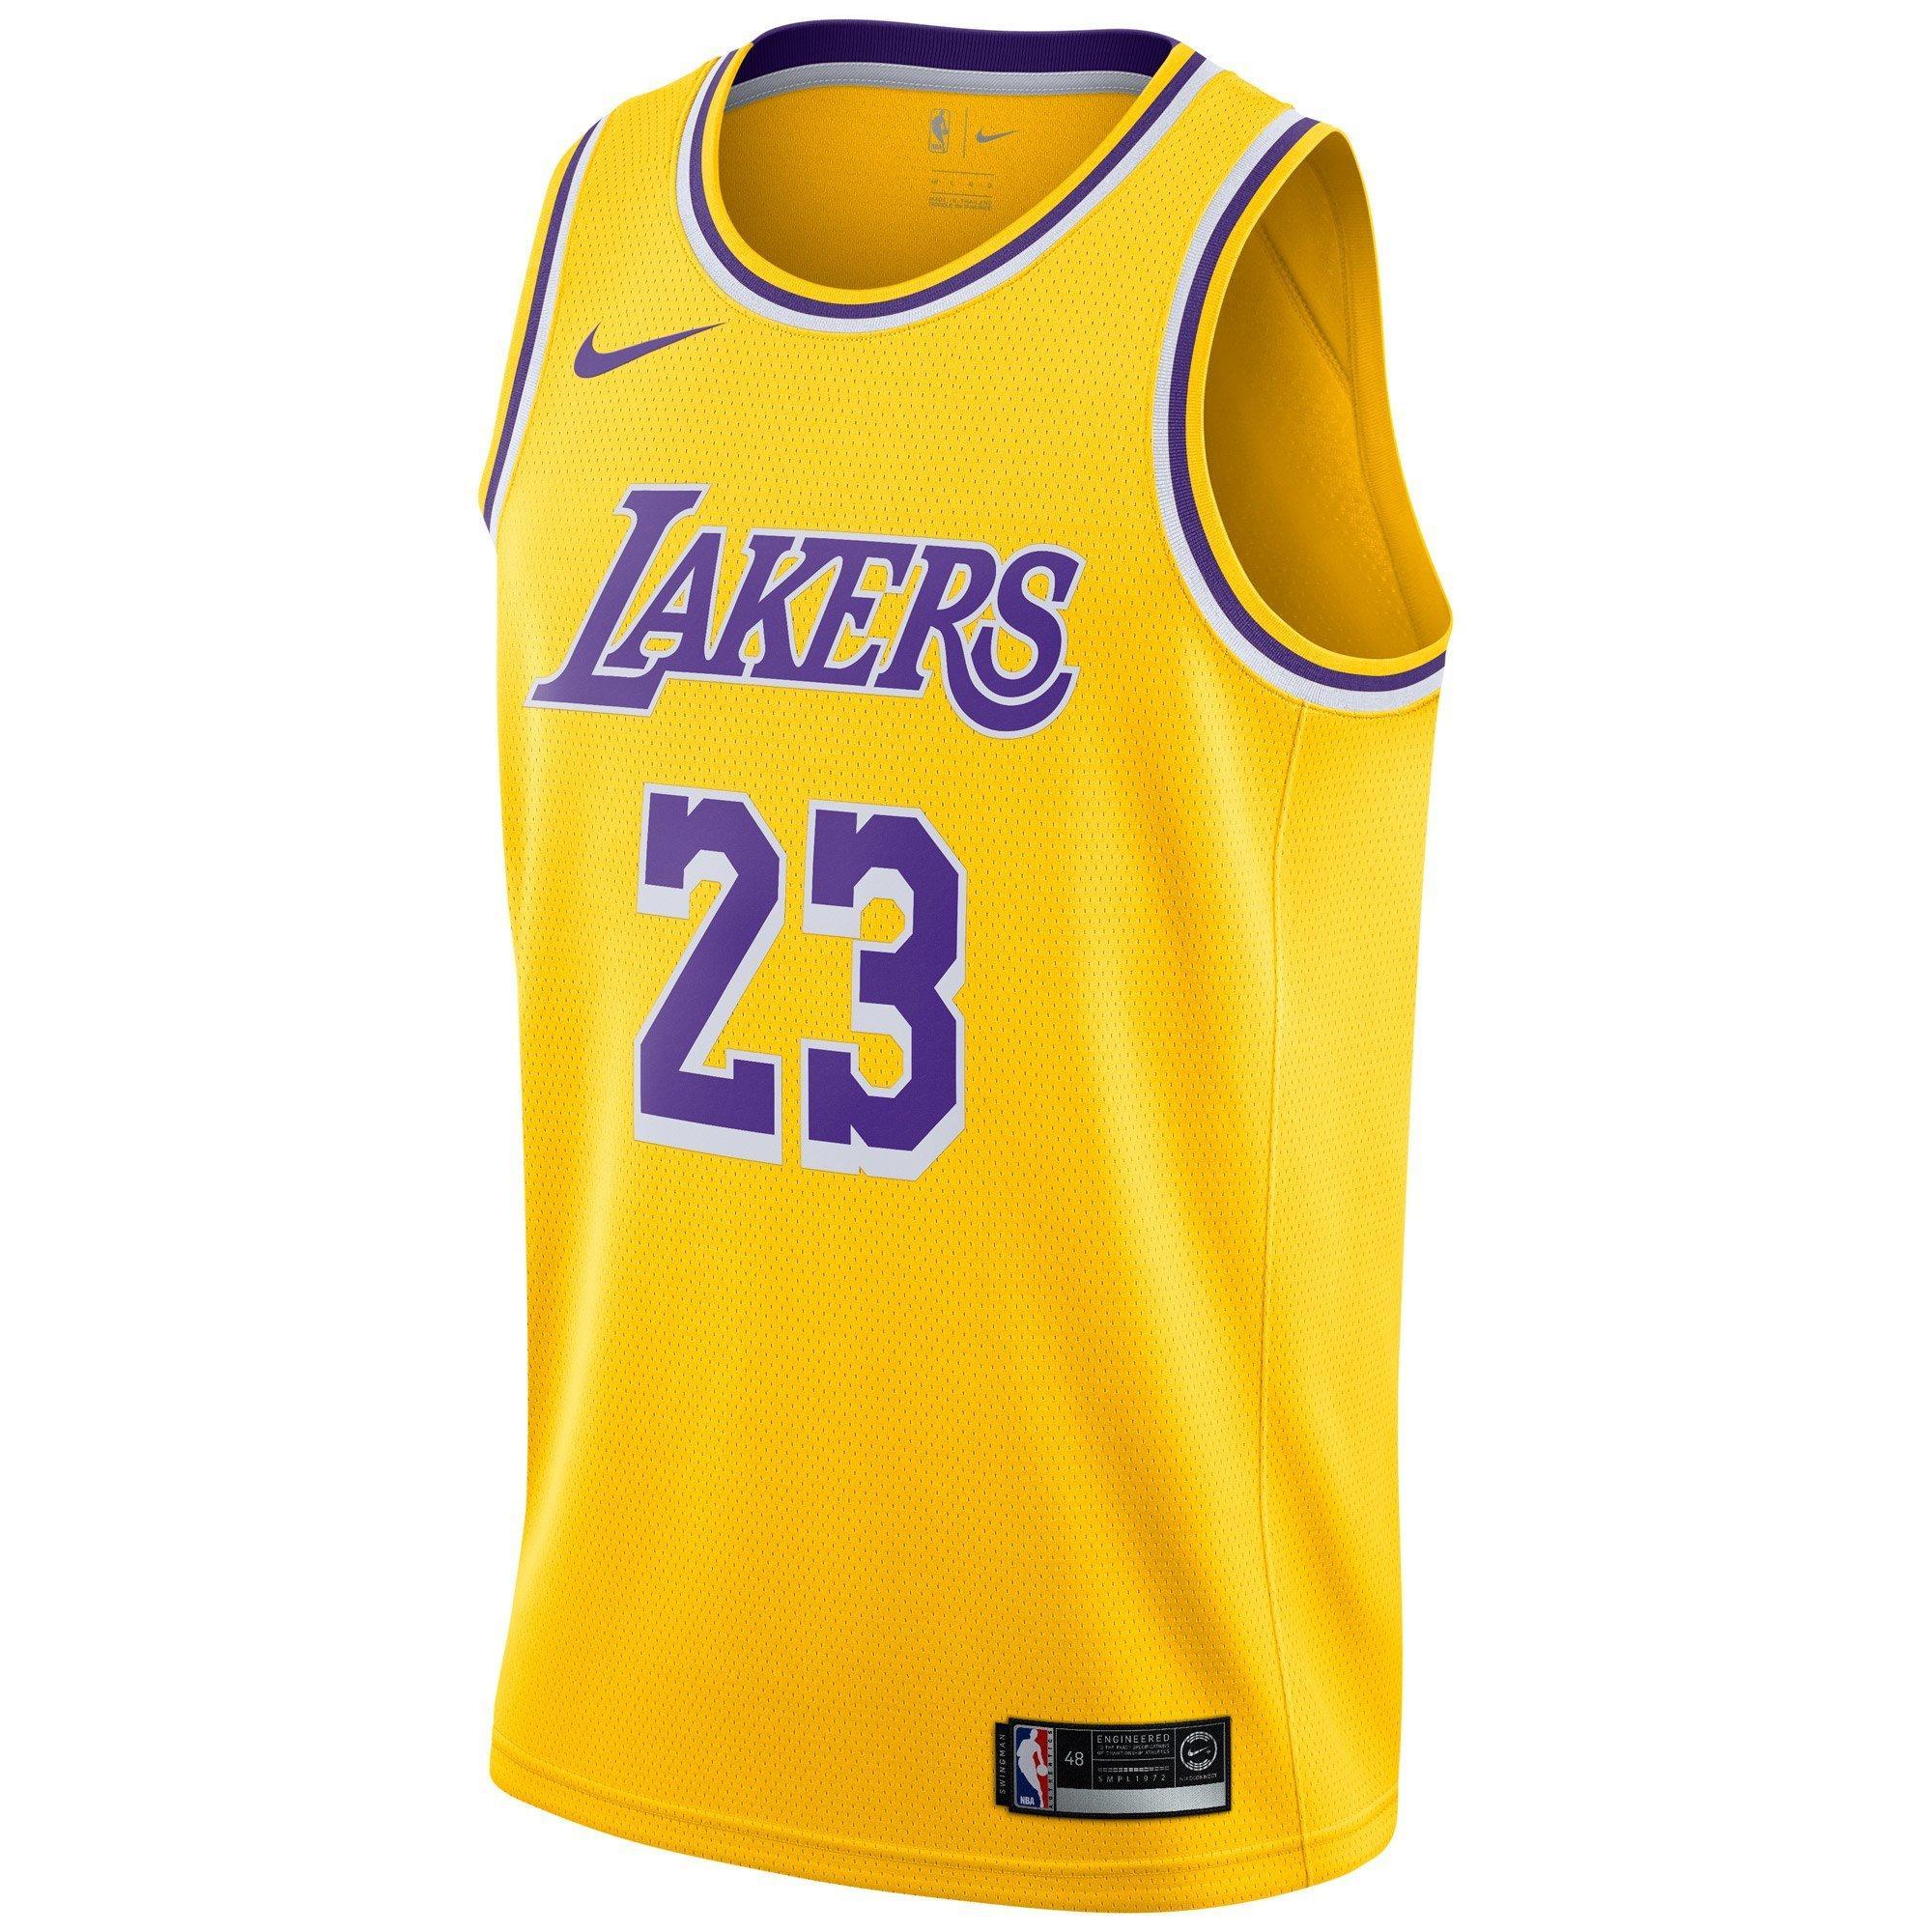 Nike Men's Lebron James Los Angeles Lakers Icon Edition Swingman Jersey